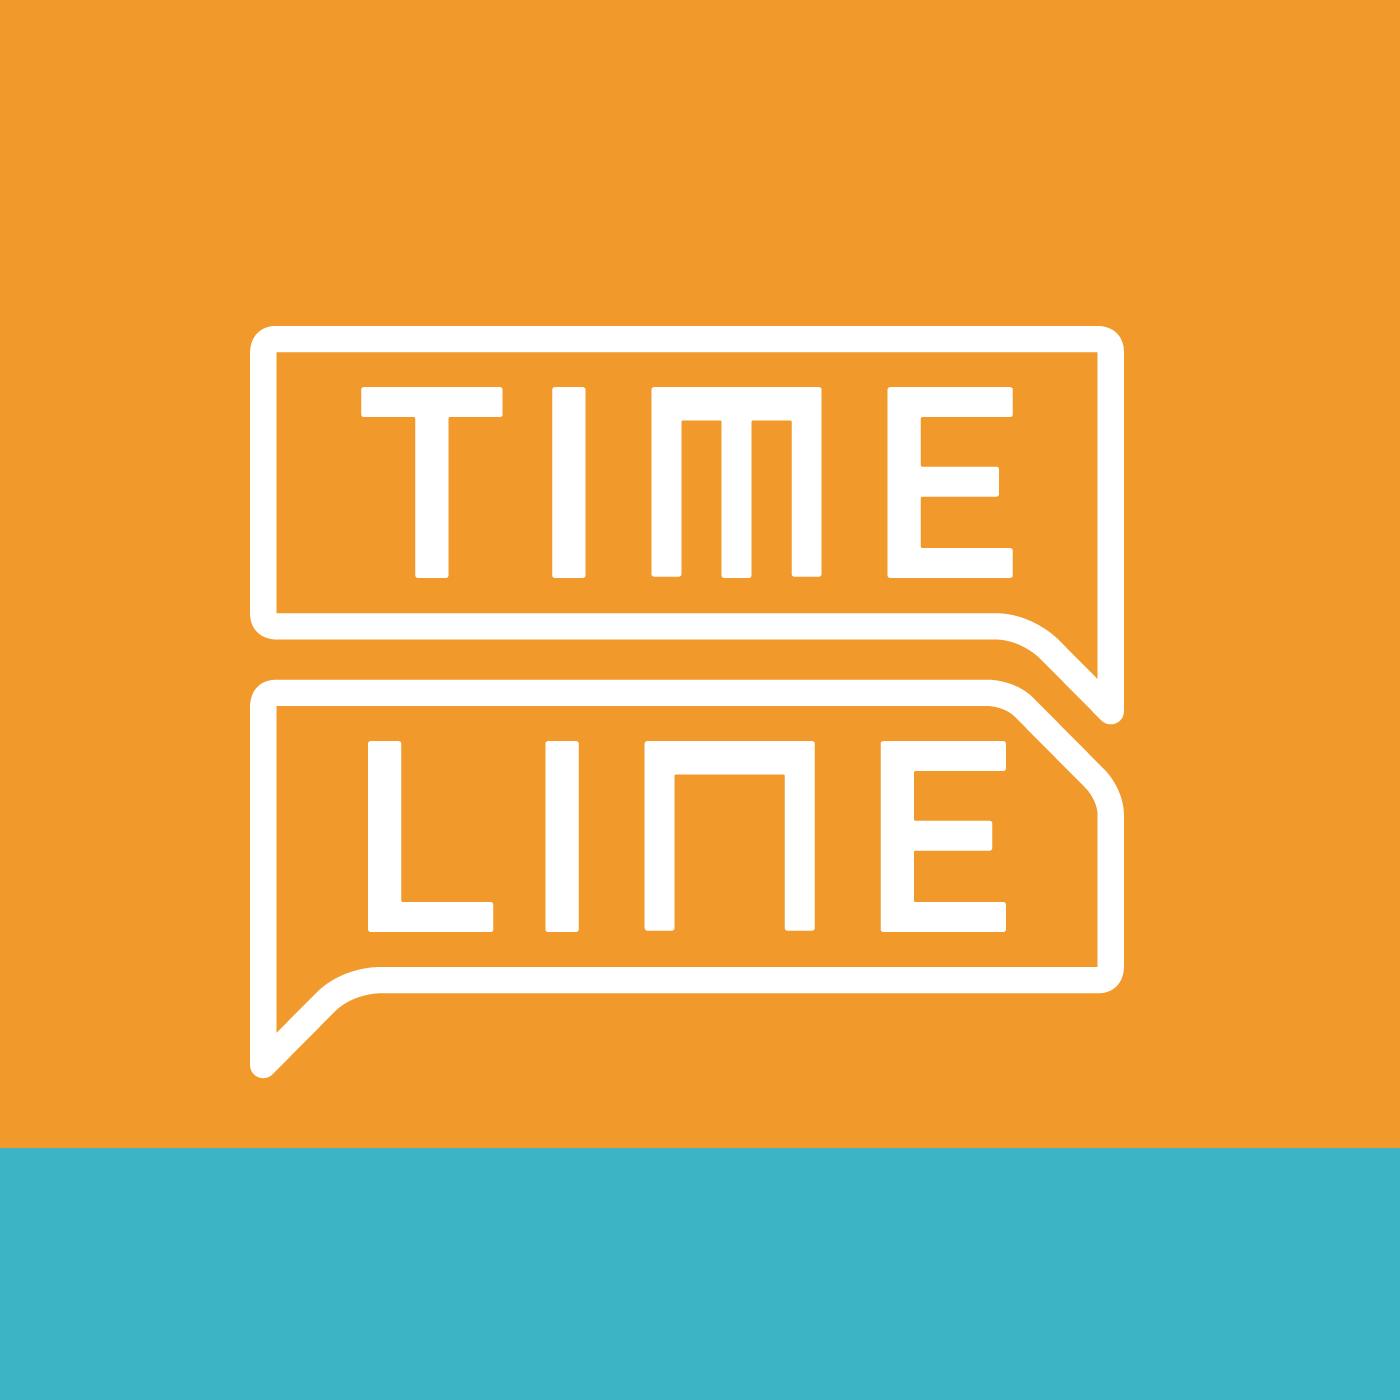 Timeline Gaúcha 19/06/2017